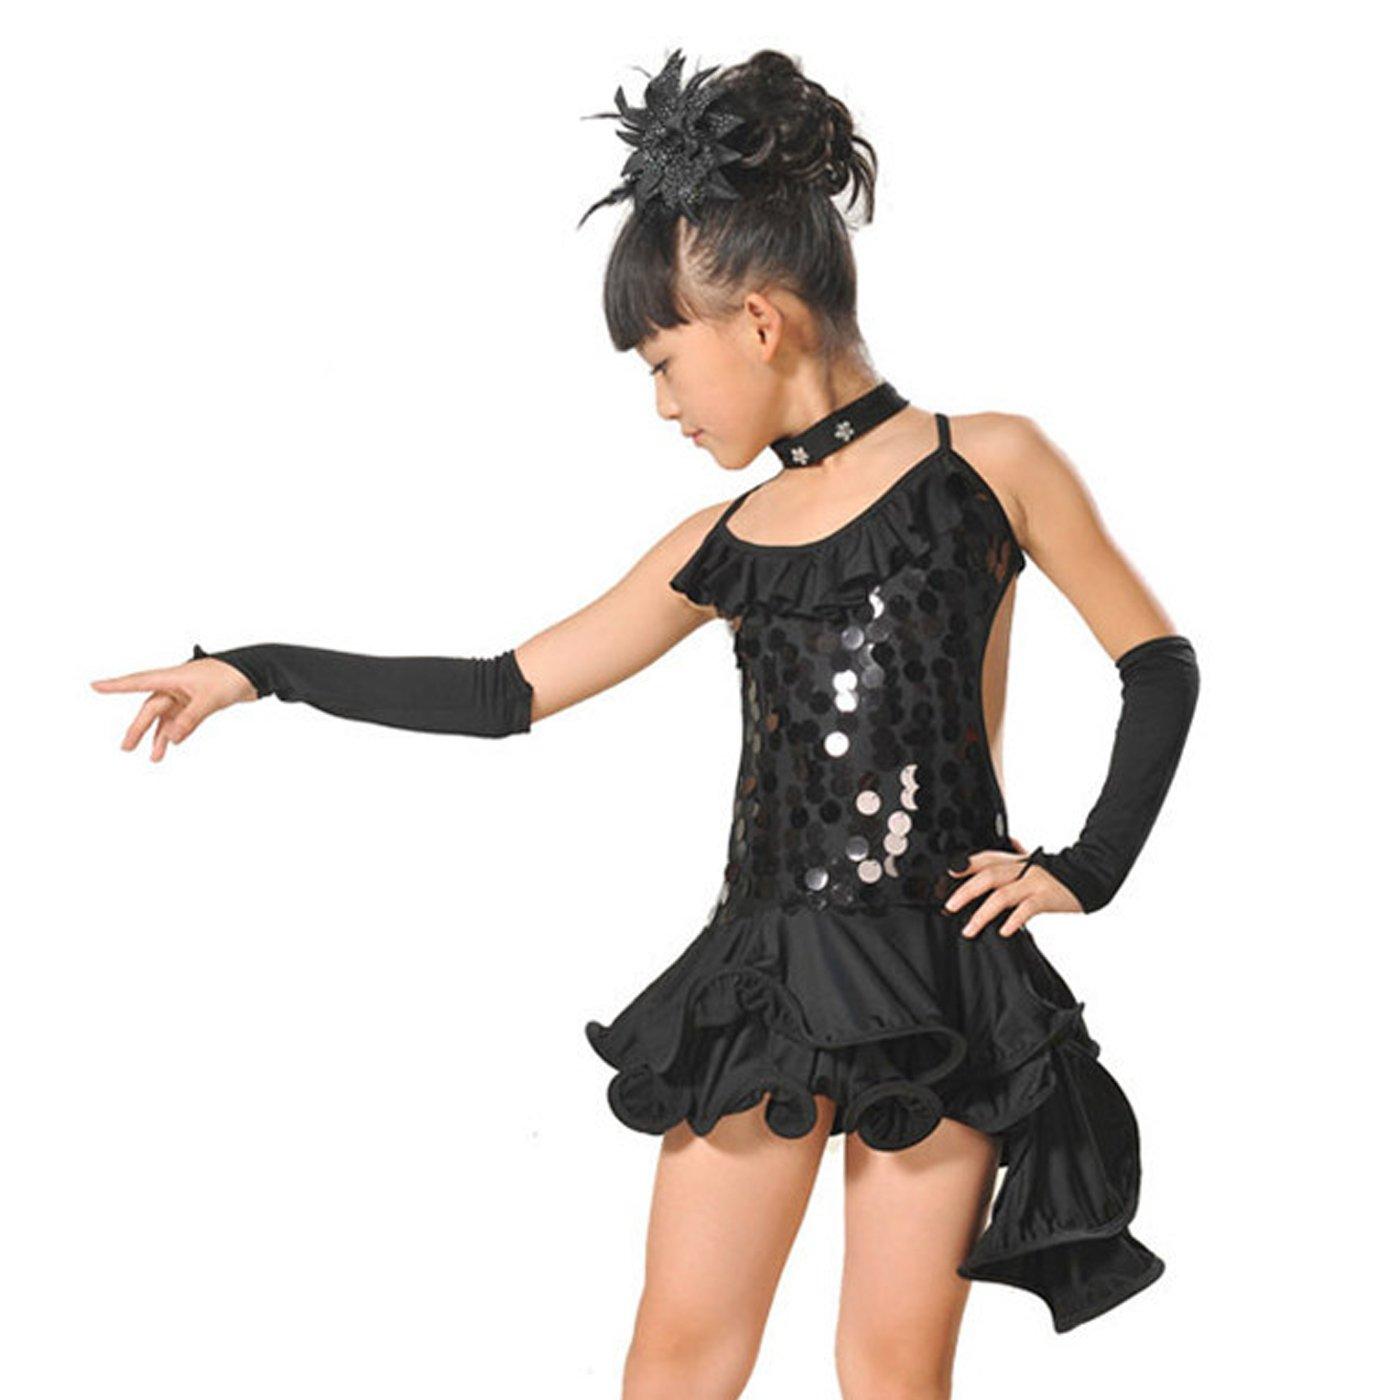 46d2d0aa98058 Feoya - Robe Costume Latino Fille Robe Danseuse Salsa Leotard Robe Danse  Irrégulière Robe à Bretelles